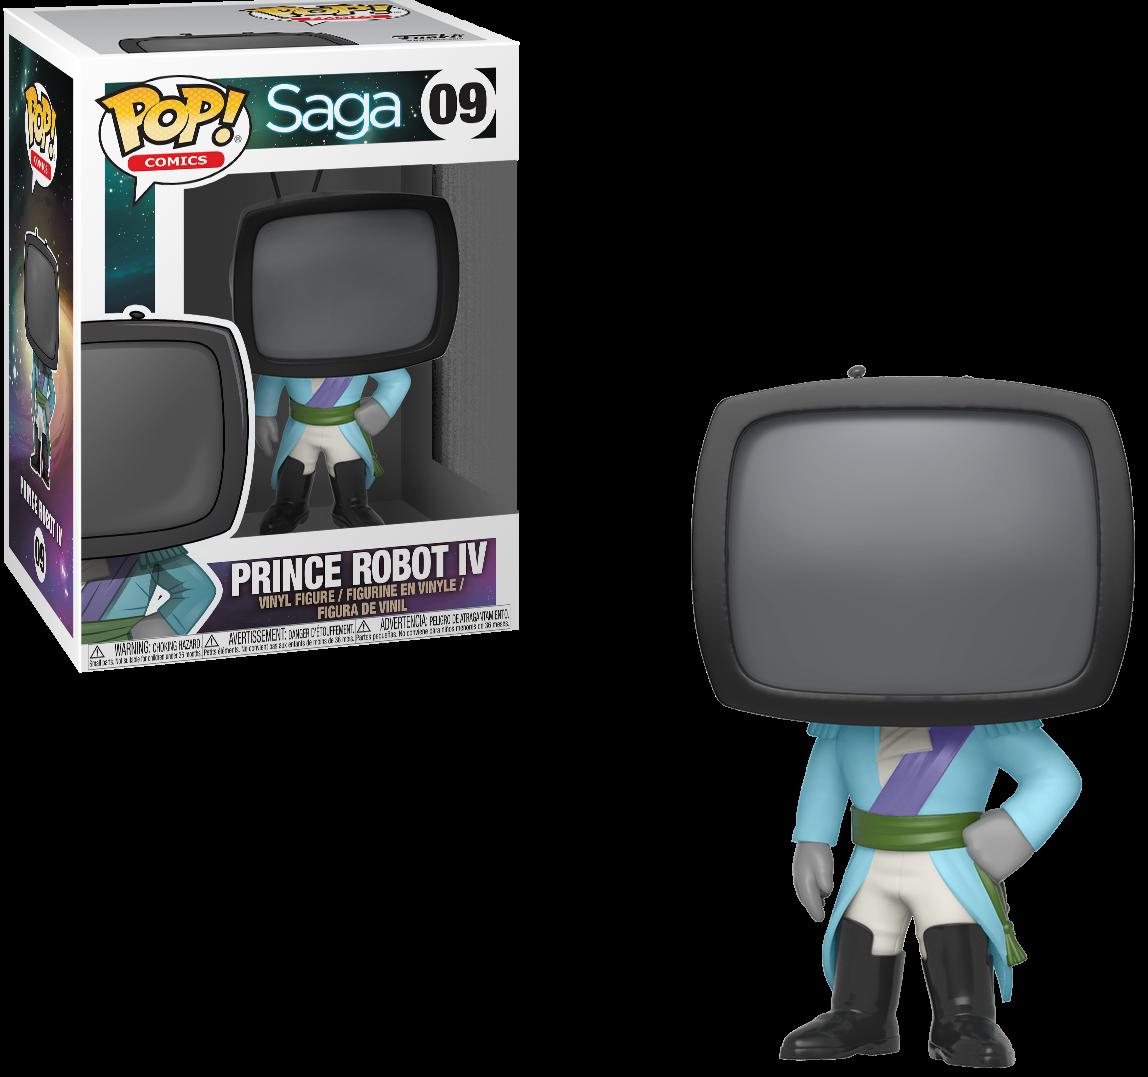 Фигурка Funko POP! Vinyl: Принц Робот IV (Prince Robot IV) Сага 1 Сезон (Saga S1) (27415) 9,5 см